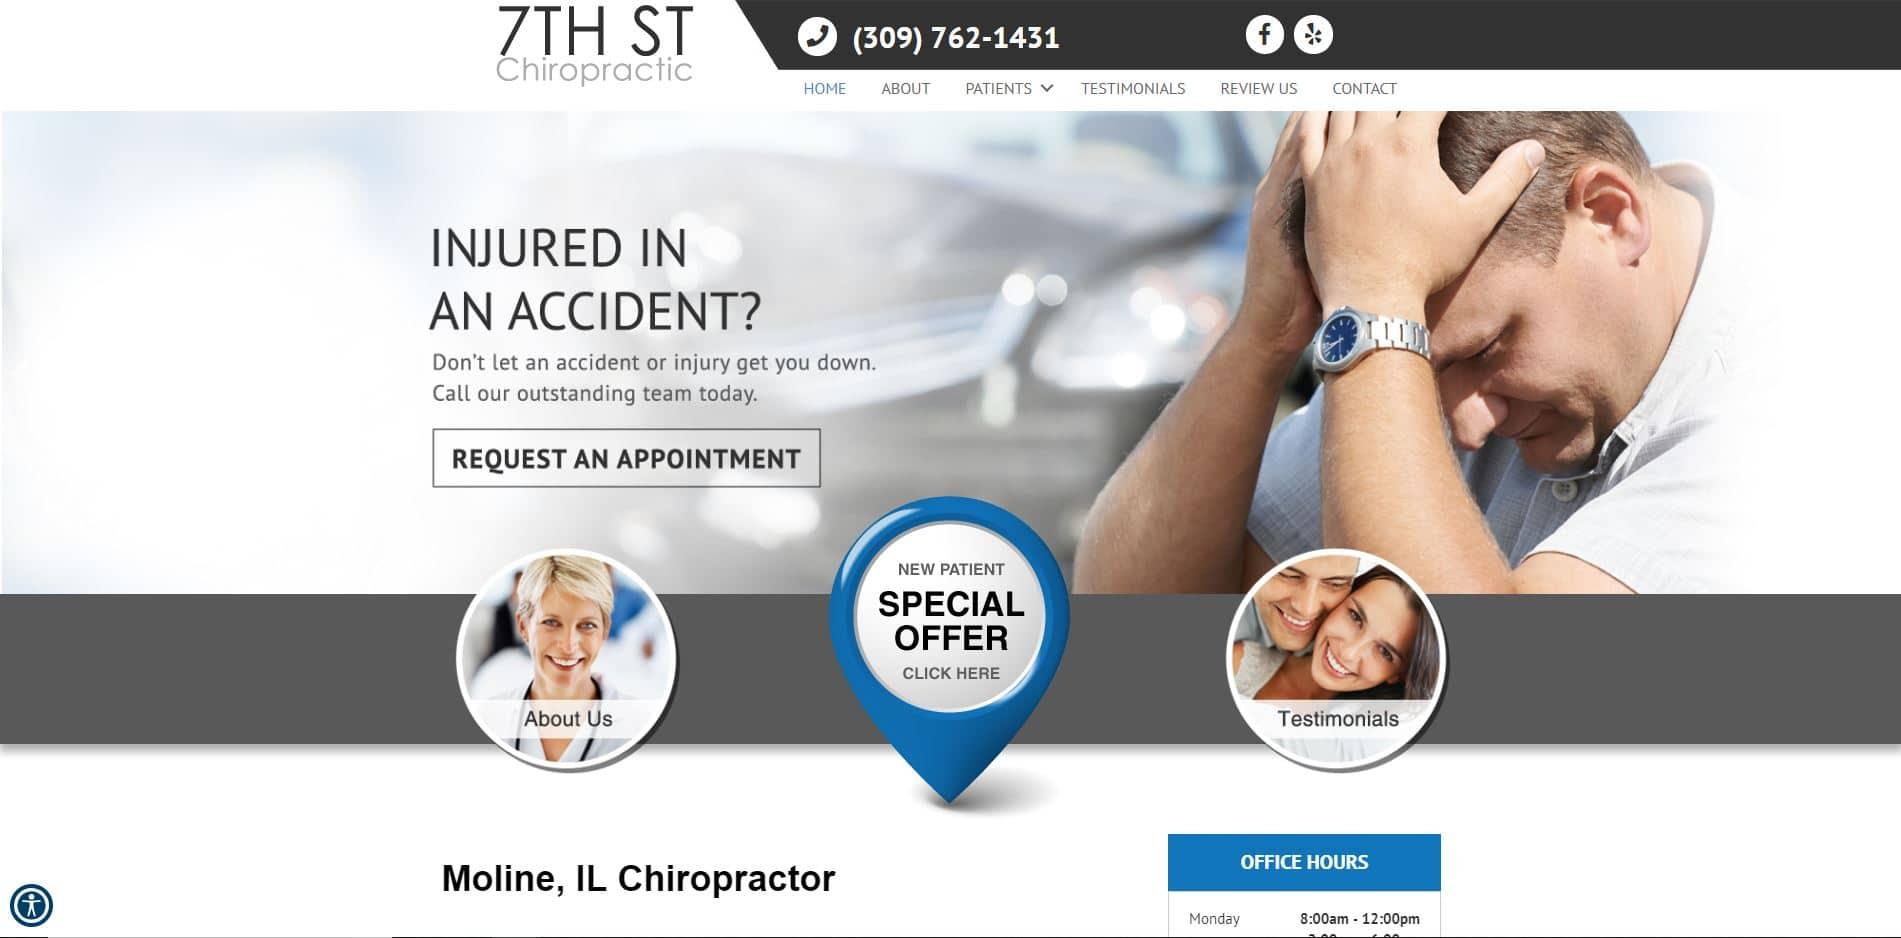 Chiropractor in Moline